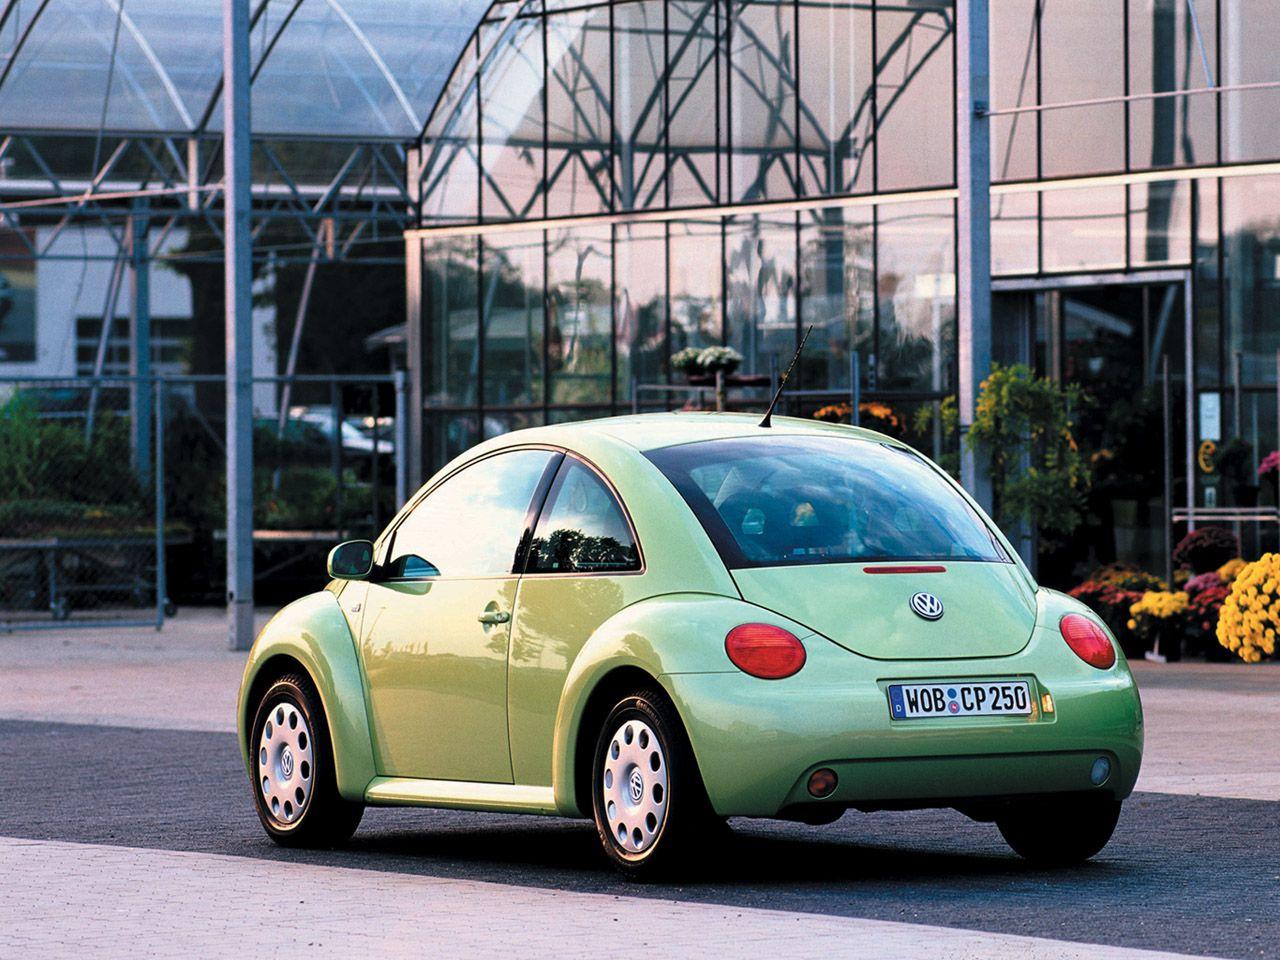 2000 Vw New Beetle Green Rear 1280x960 New Beetle Vw New Beetle Volkswagen Beetle